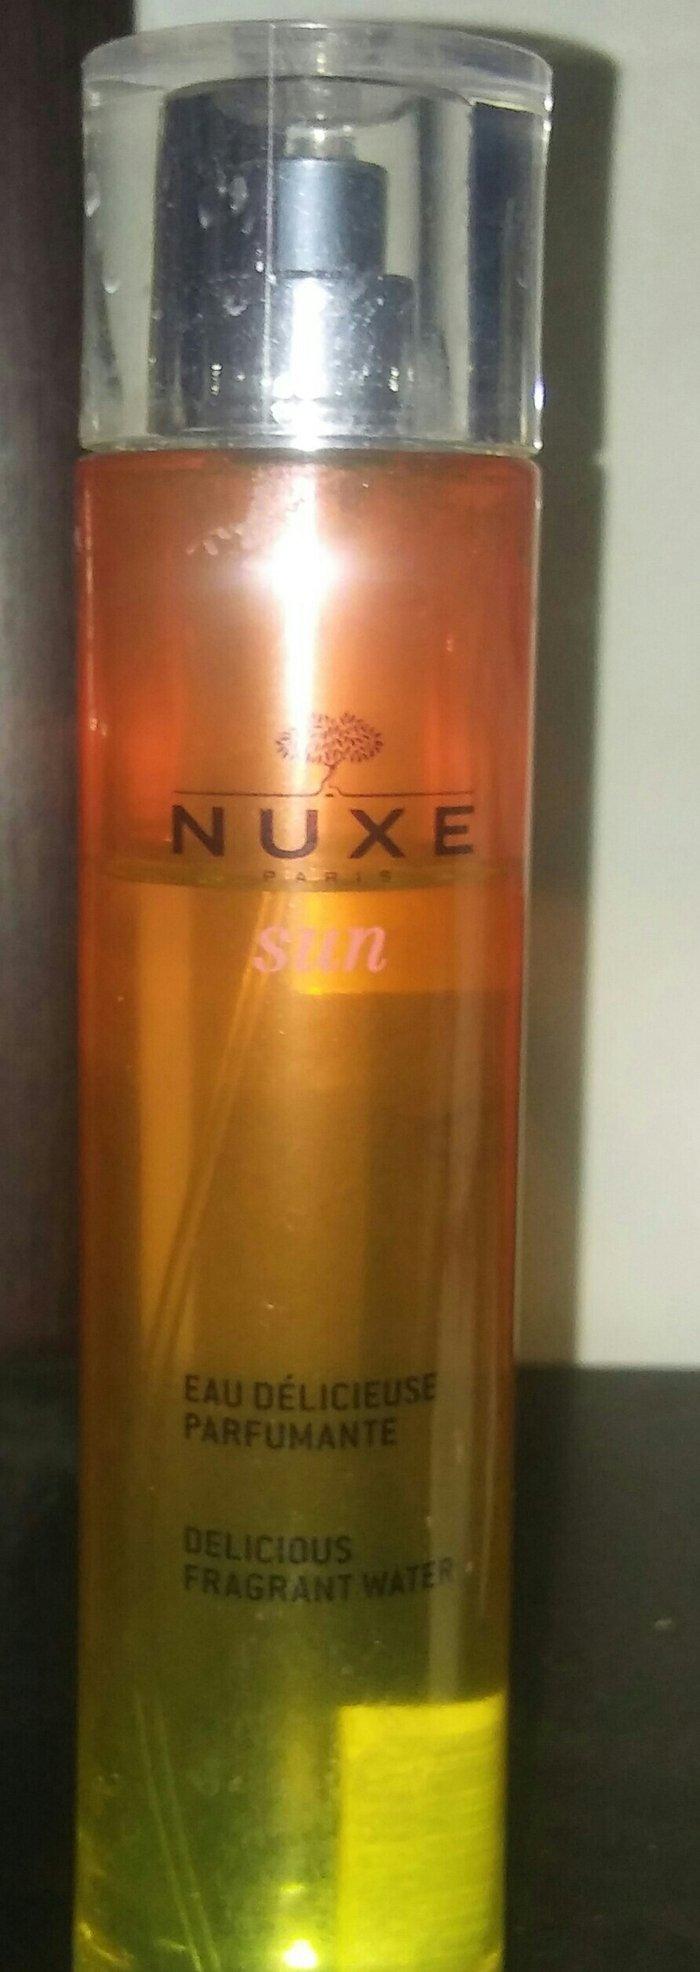 Nuxe. sun mist . ιδανικο για καλοκαιρι σε Αθήνα